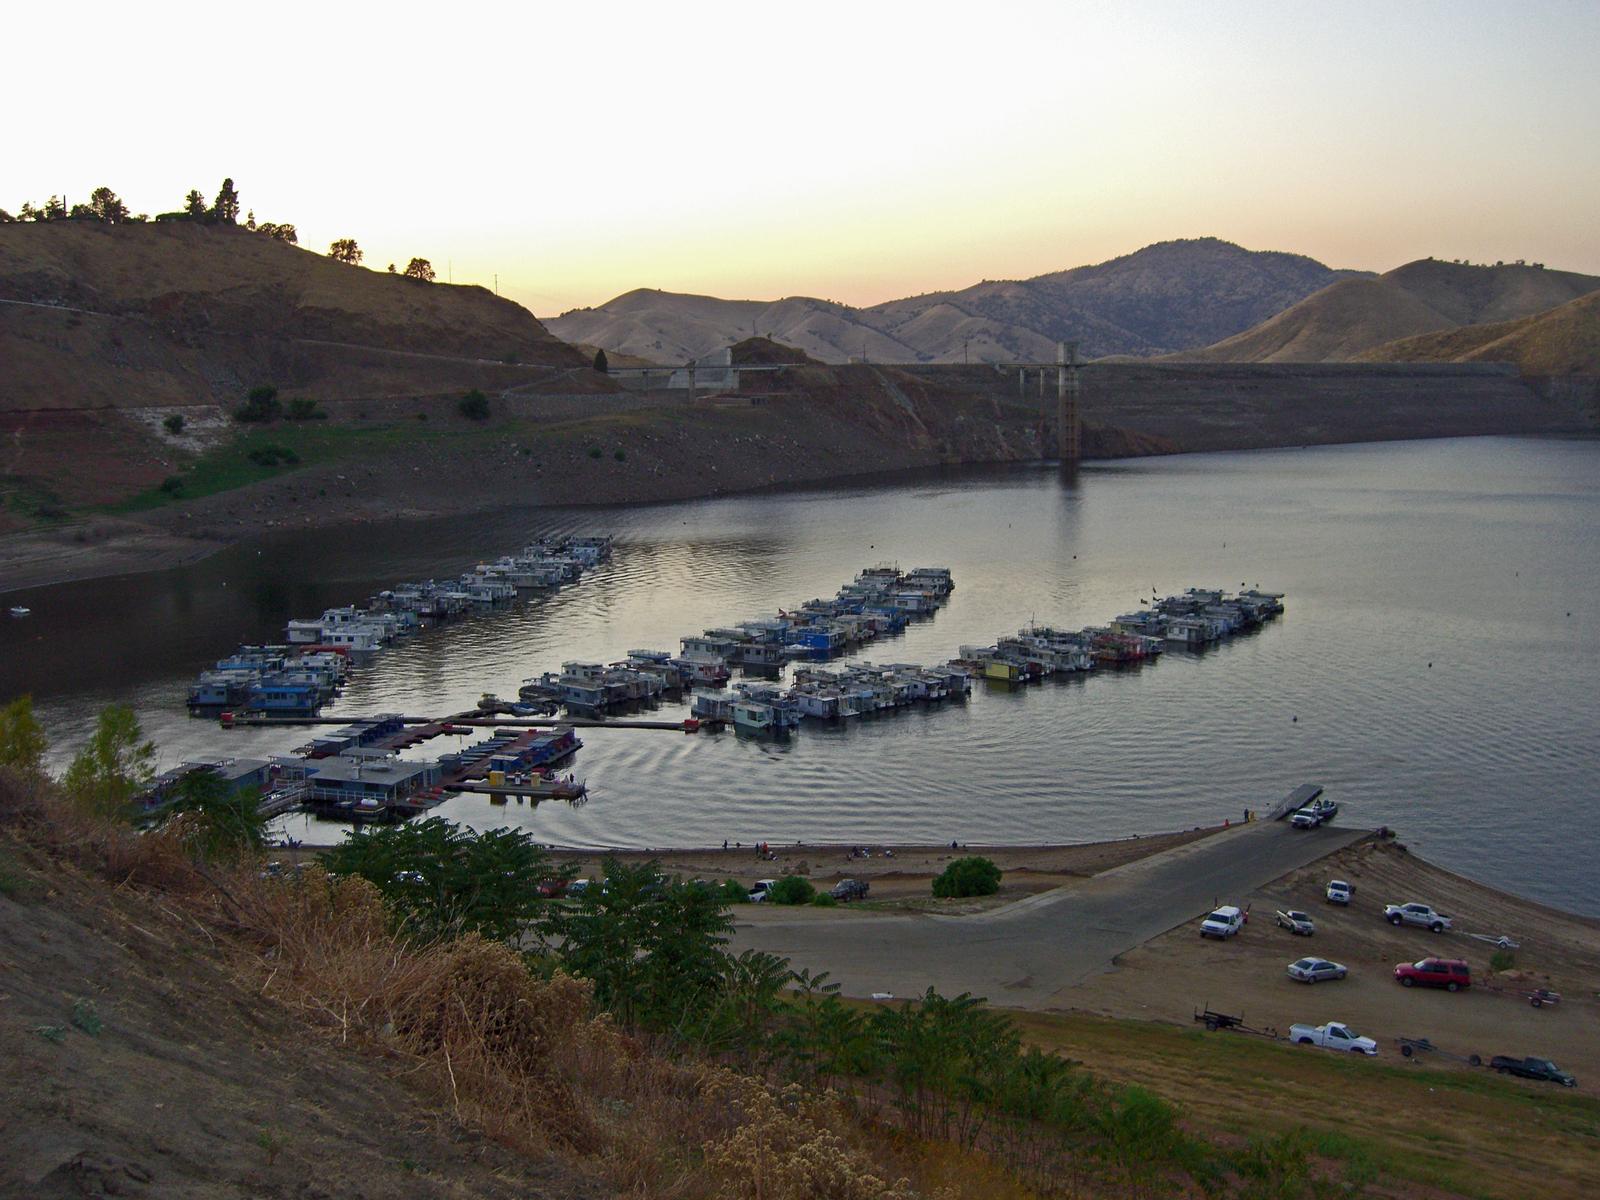 Lake Kaweah at Dusk, Boats, Bspo06, Cars, Dusk, HQ Photo